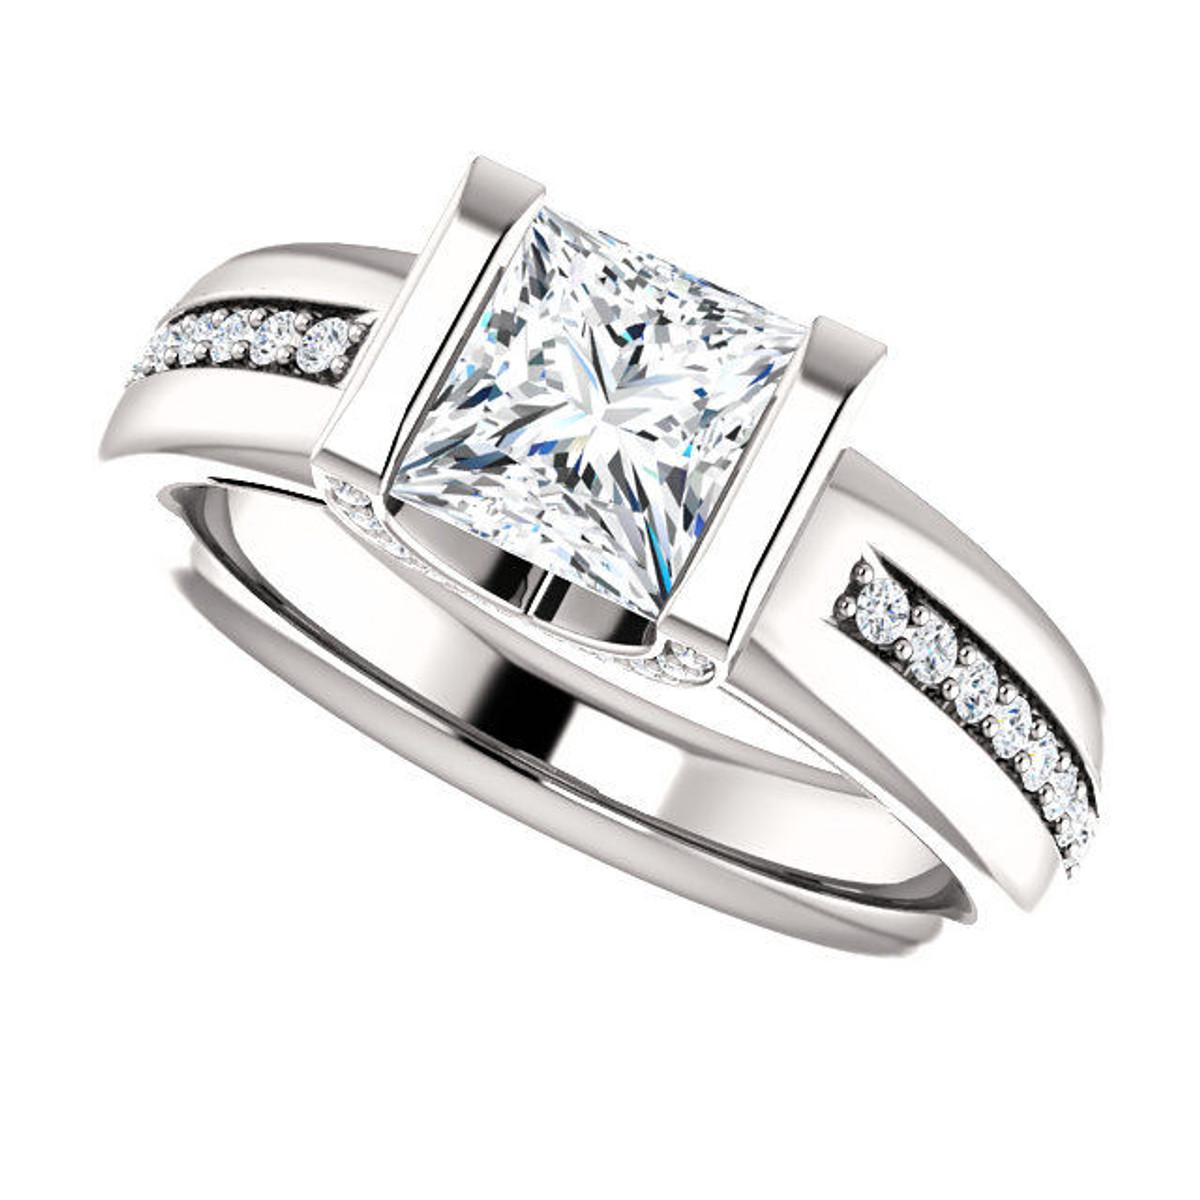 White Gold Princess Cut Diamond Engagement Ring